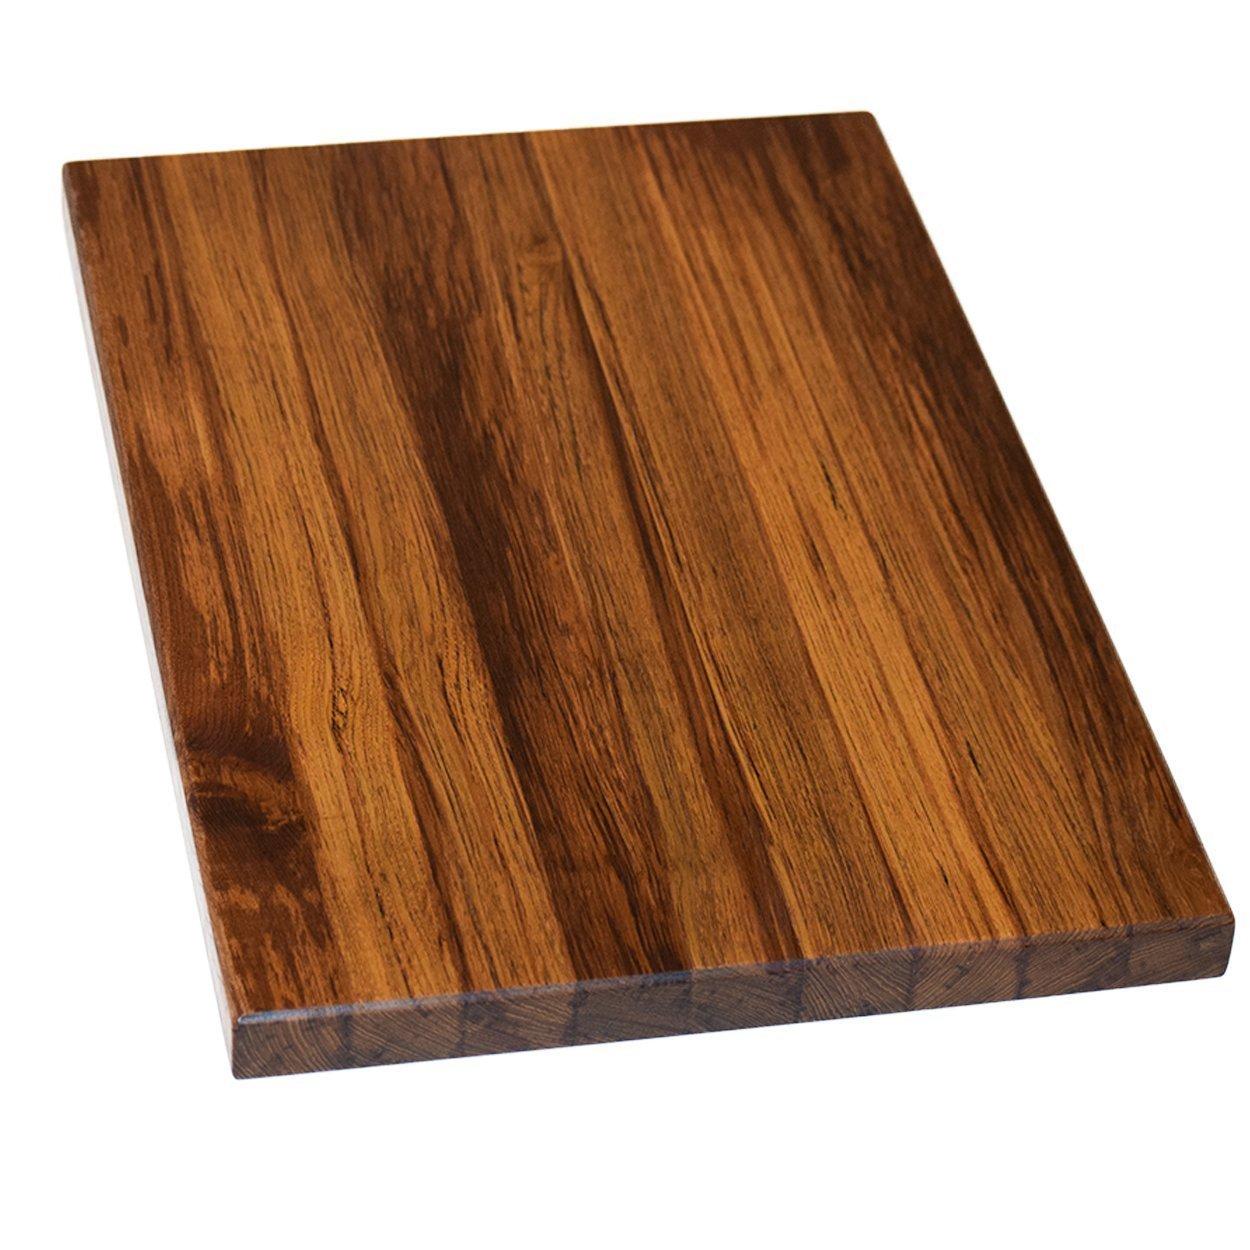 Teak Wood Edge Grain Cutting Board Handmade Reversible Butcher Block by The Practical Plankist (Image #2)